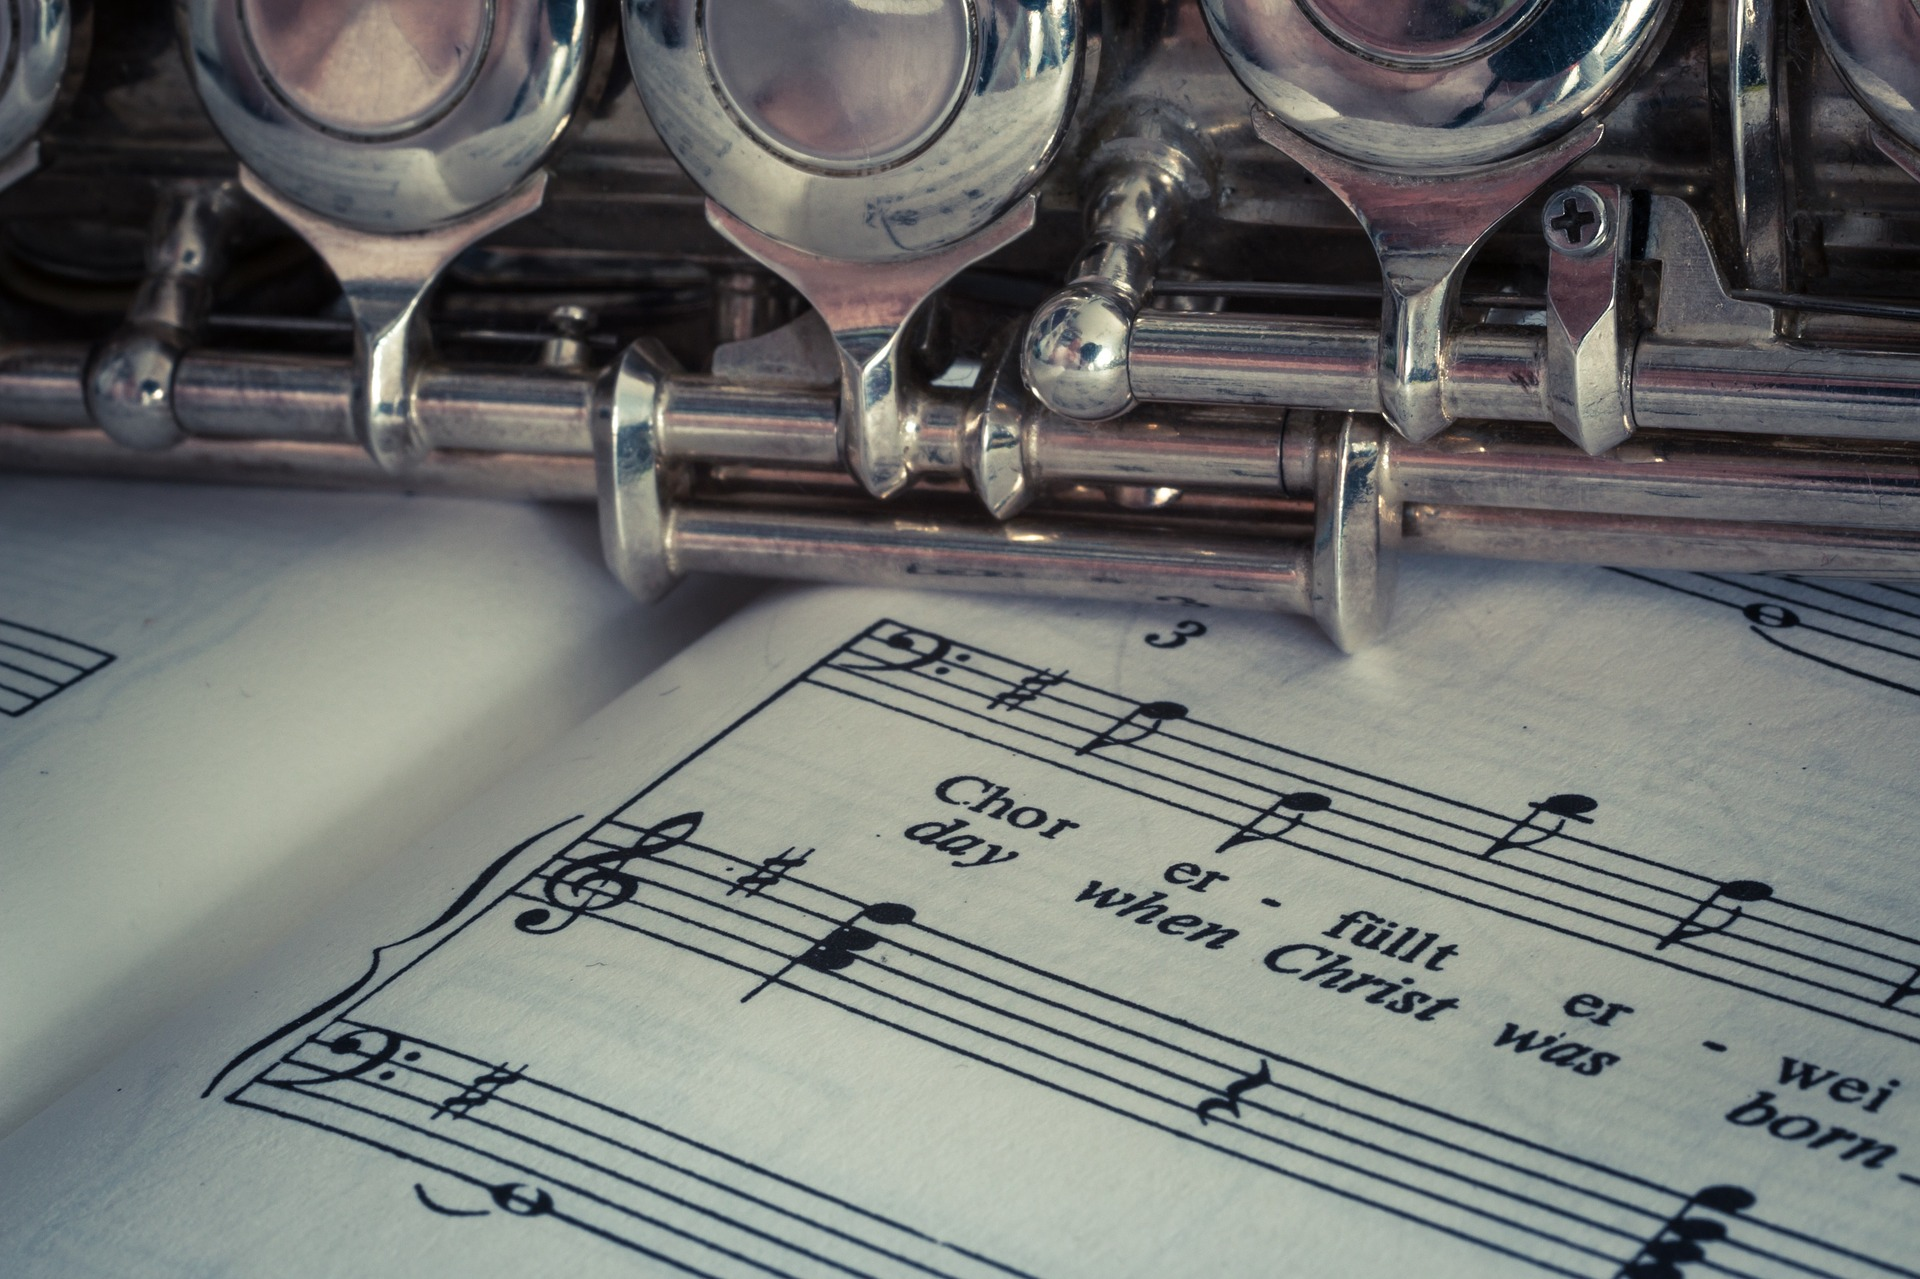 flauta, 乐谱, 乐器, 工作人员, 音符, flauta travesera, 银 -长笛教授-falken.com